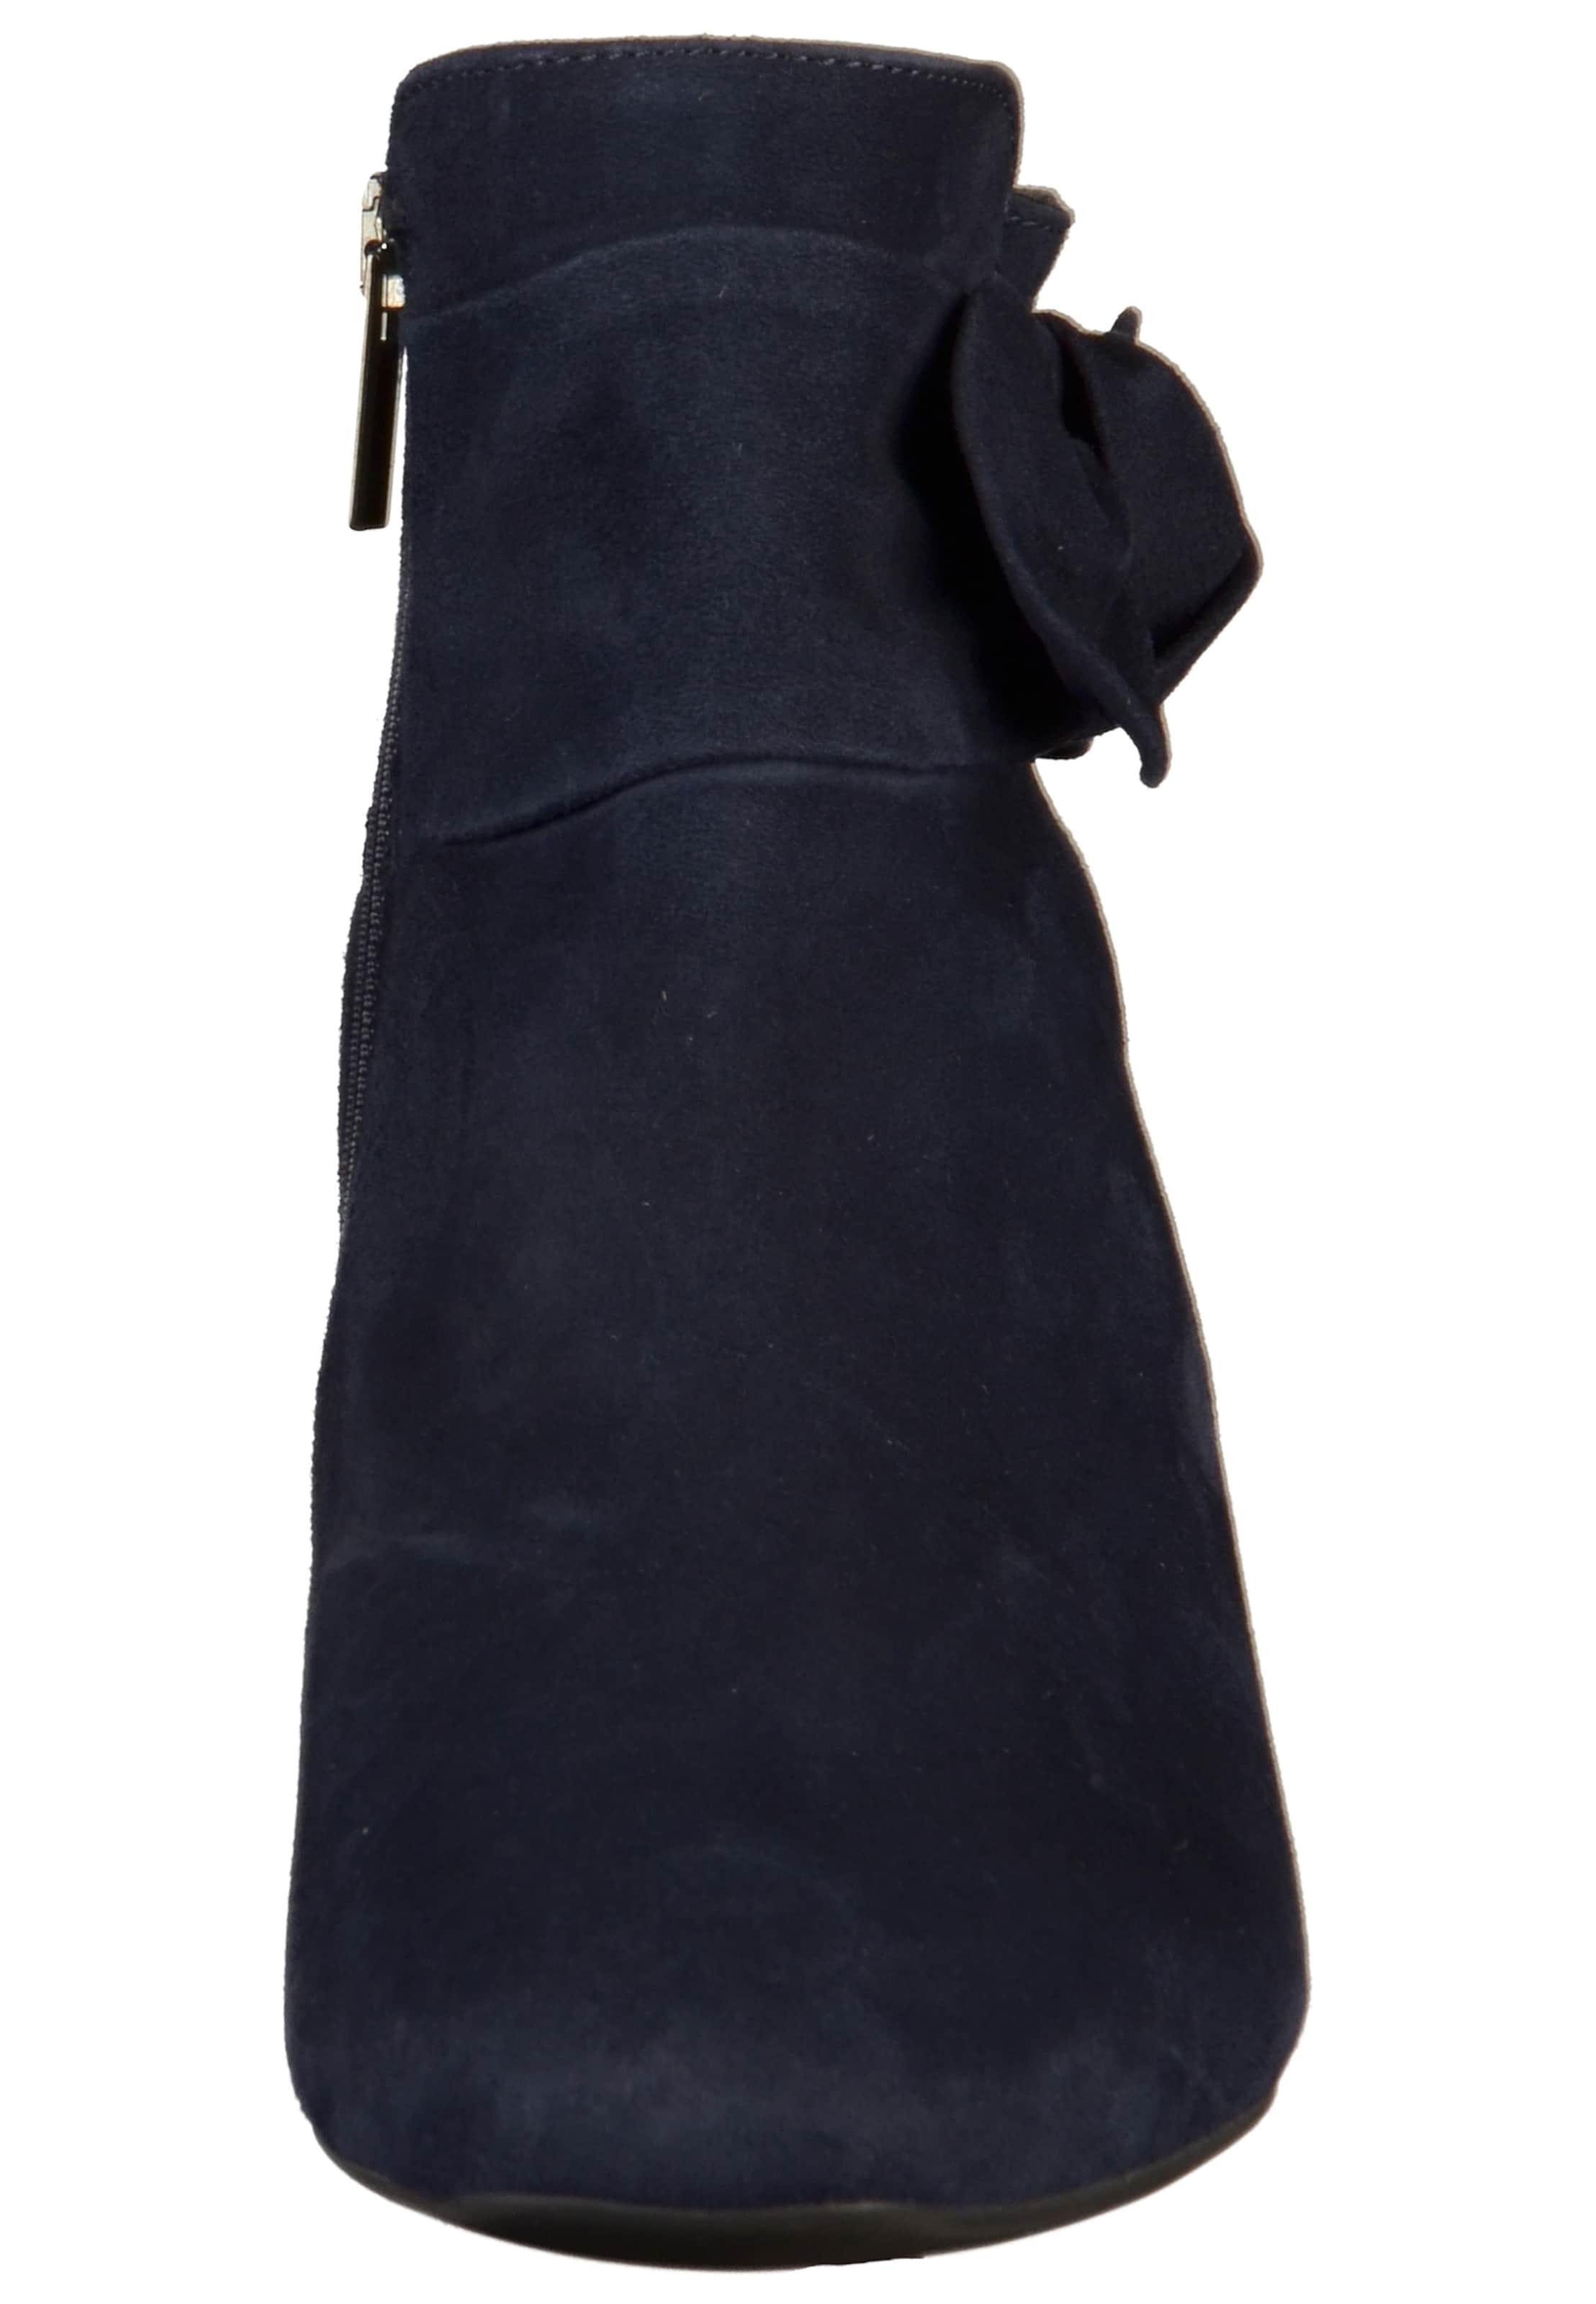 PETER KAISER Stiefelette Stiefelette Stiefelette Leder Bequem, gut aussehend 31f496